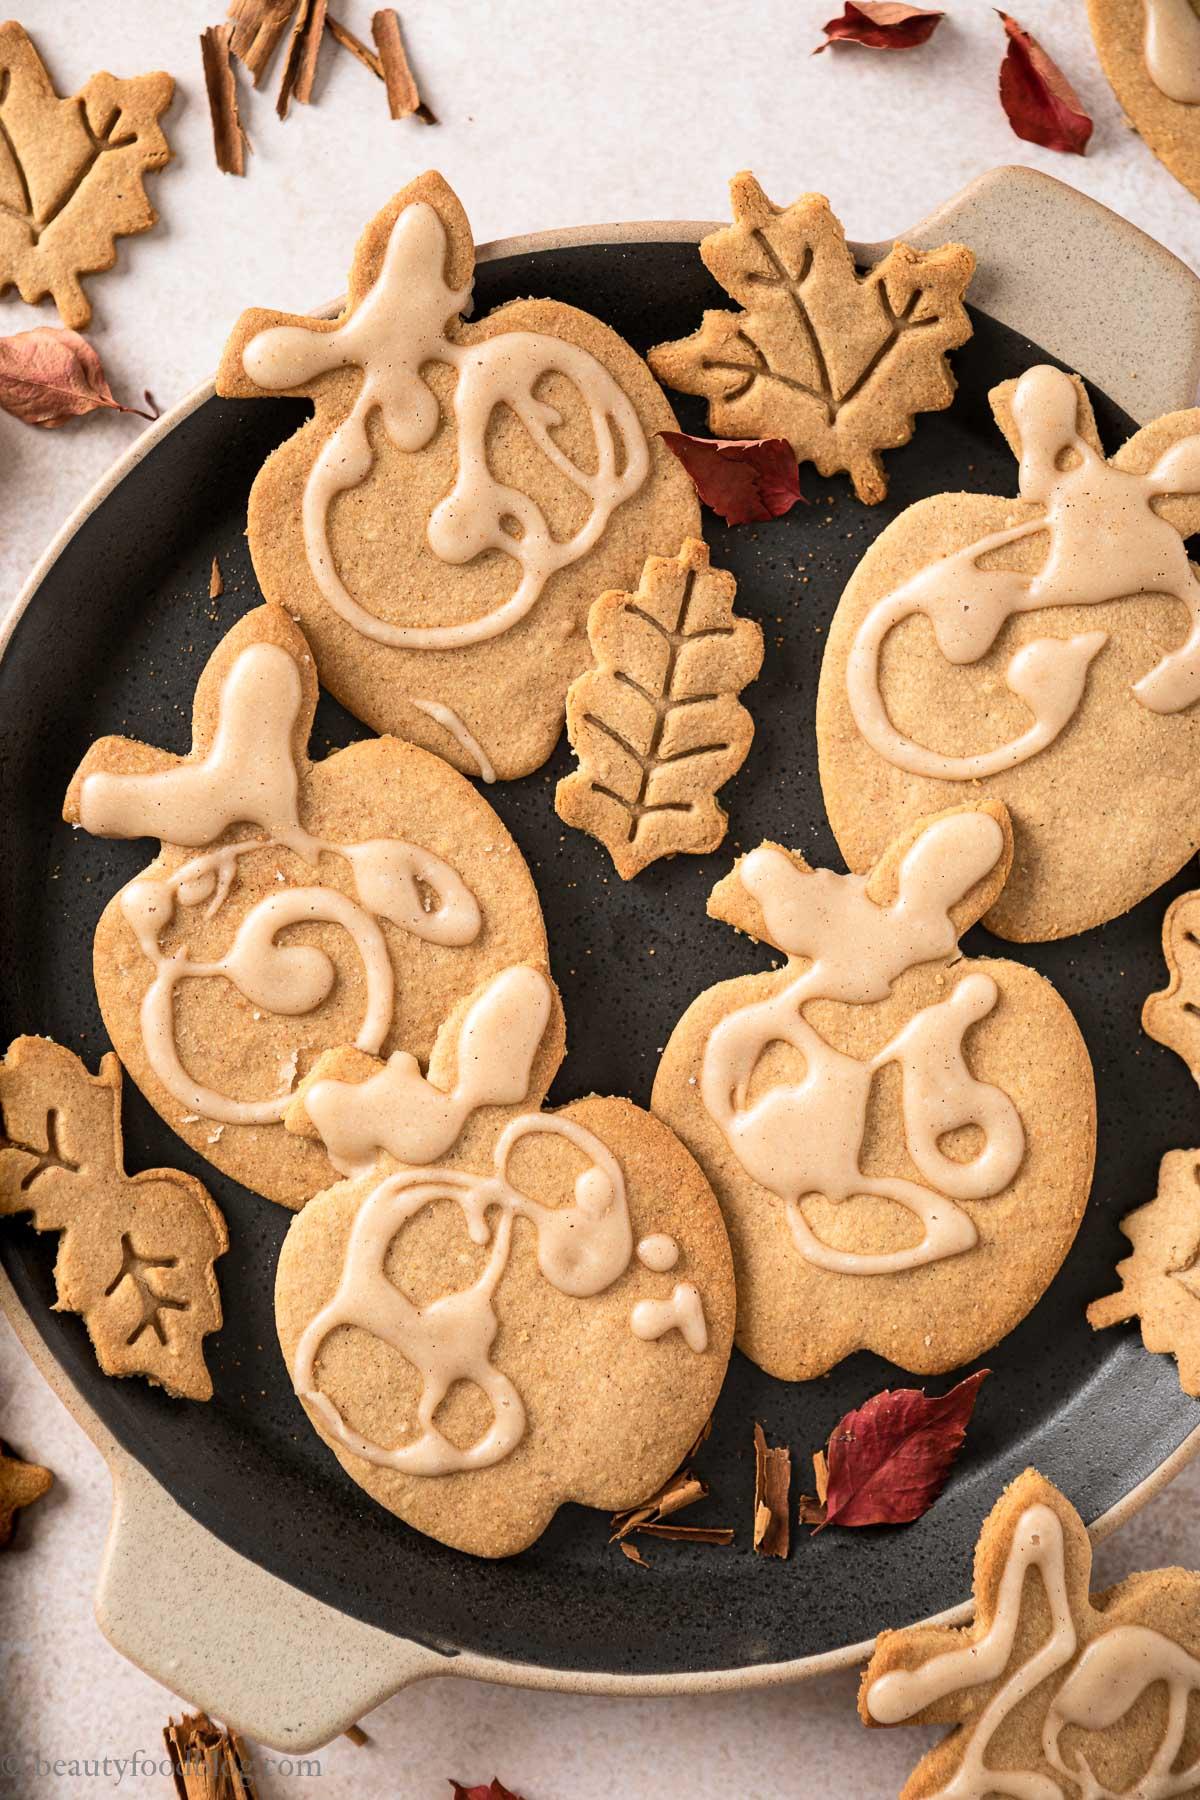 gluten-free vegan maple cookies with applesauce with maple glaze recipe ricetta Biscotti Autunnali Senza Burro Senza Glutine vegan alle mele e sciroppo d'acero